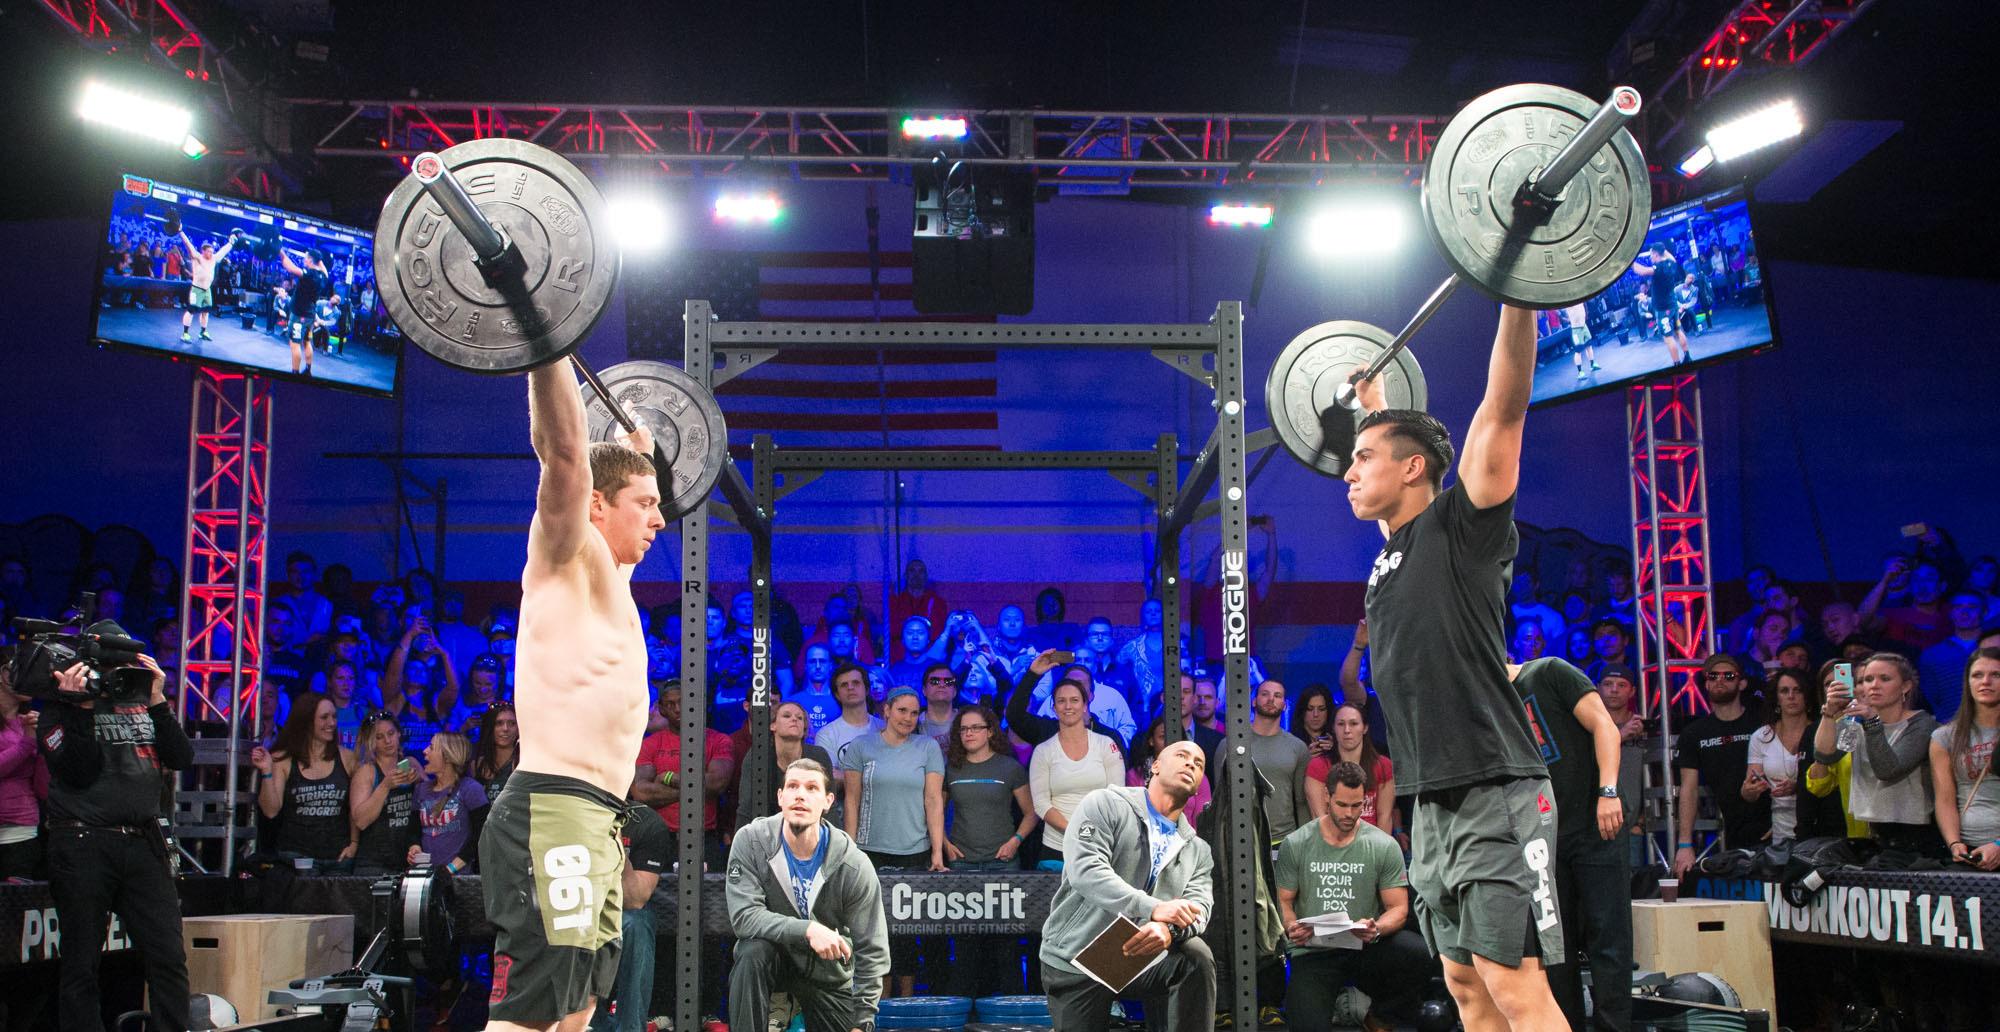 Photo Courtesy of CrossFit Inc